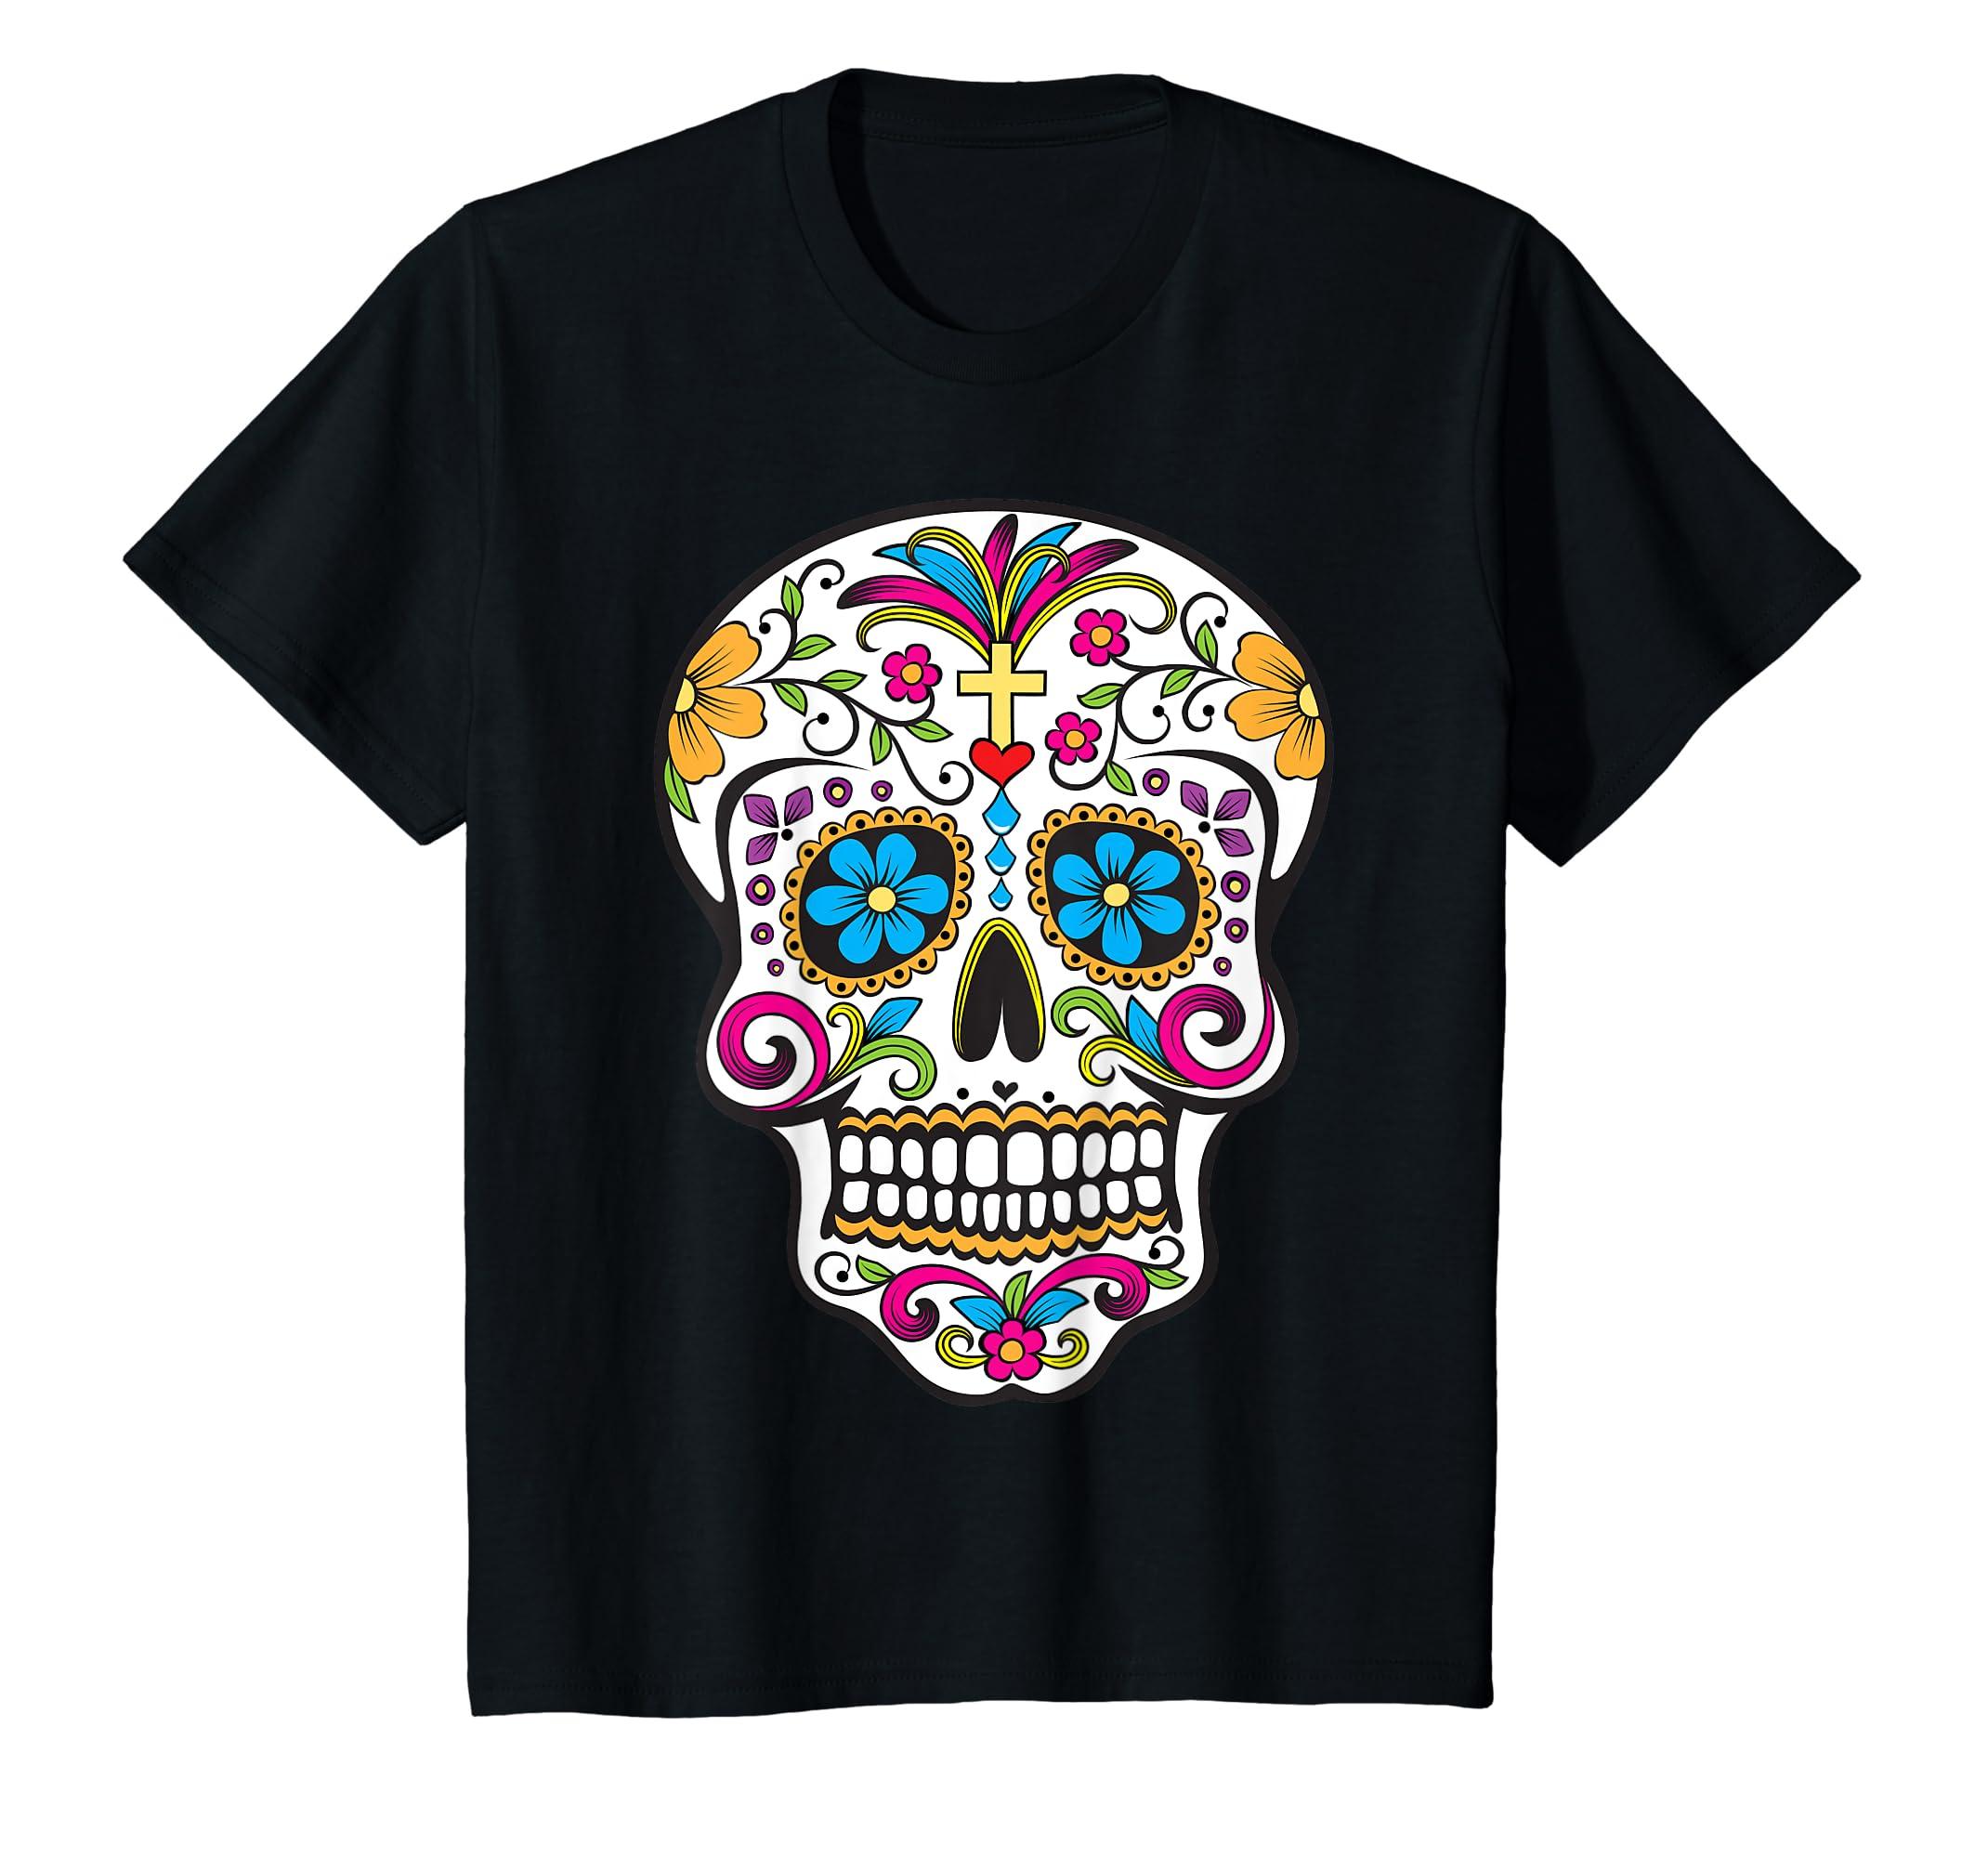 9163fc9e Amazon.com: Day of the Dead Sugar Skull T-Shirt: Clothing